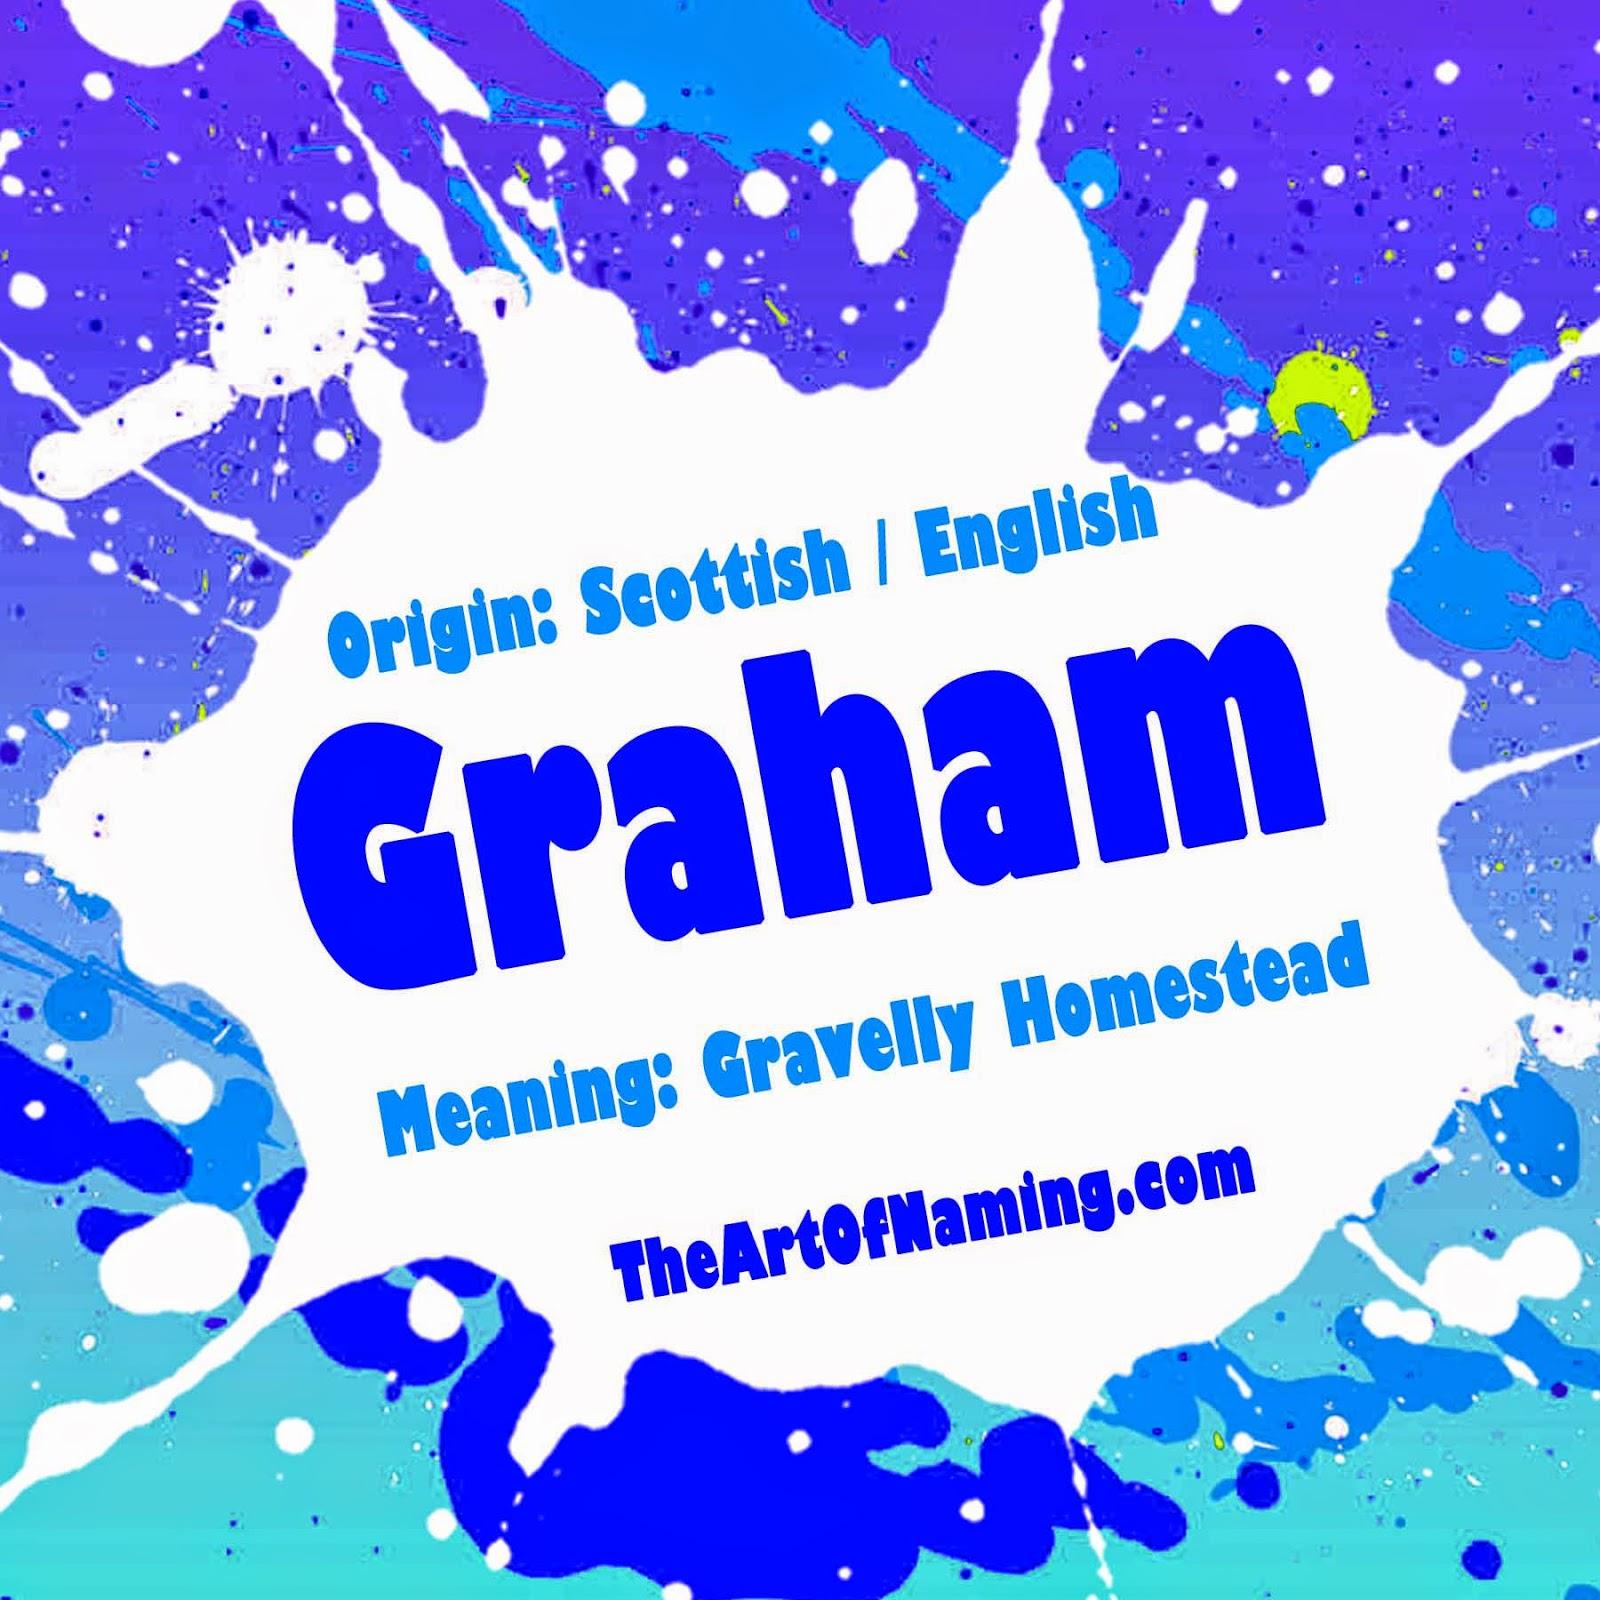 The Art of Naming: Graham